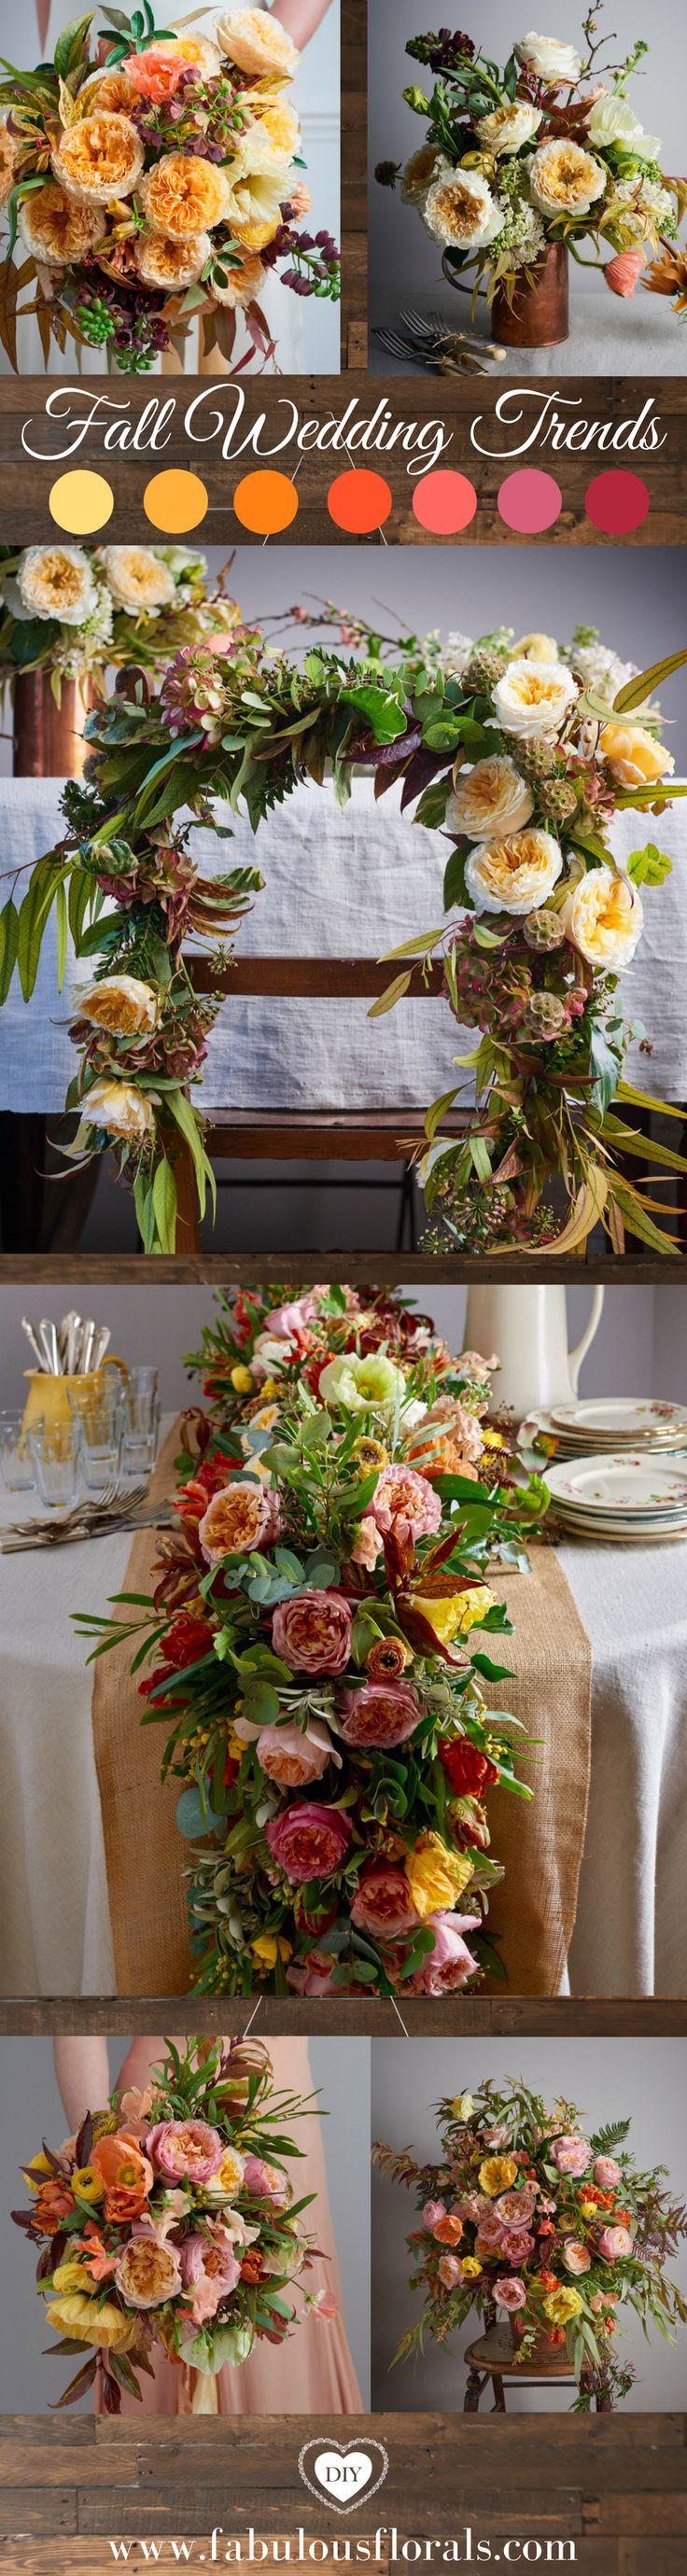 Fall Wedding Ideas Fall wedding Colors.  Autumn centerpieces and Fall decor. Wedding Trends holiday autumn Weddings #fallweddingideas #fallweddingcolors #fallweddingtheme